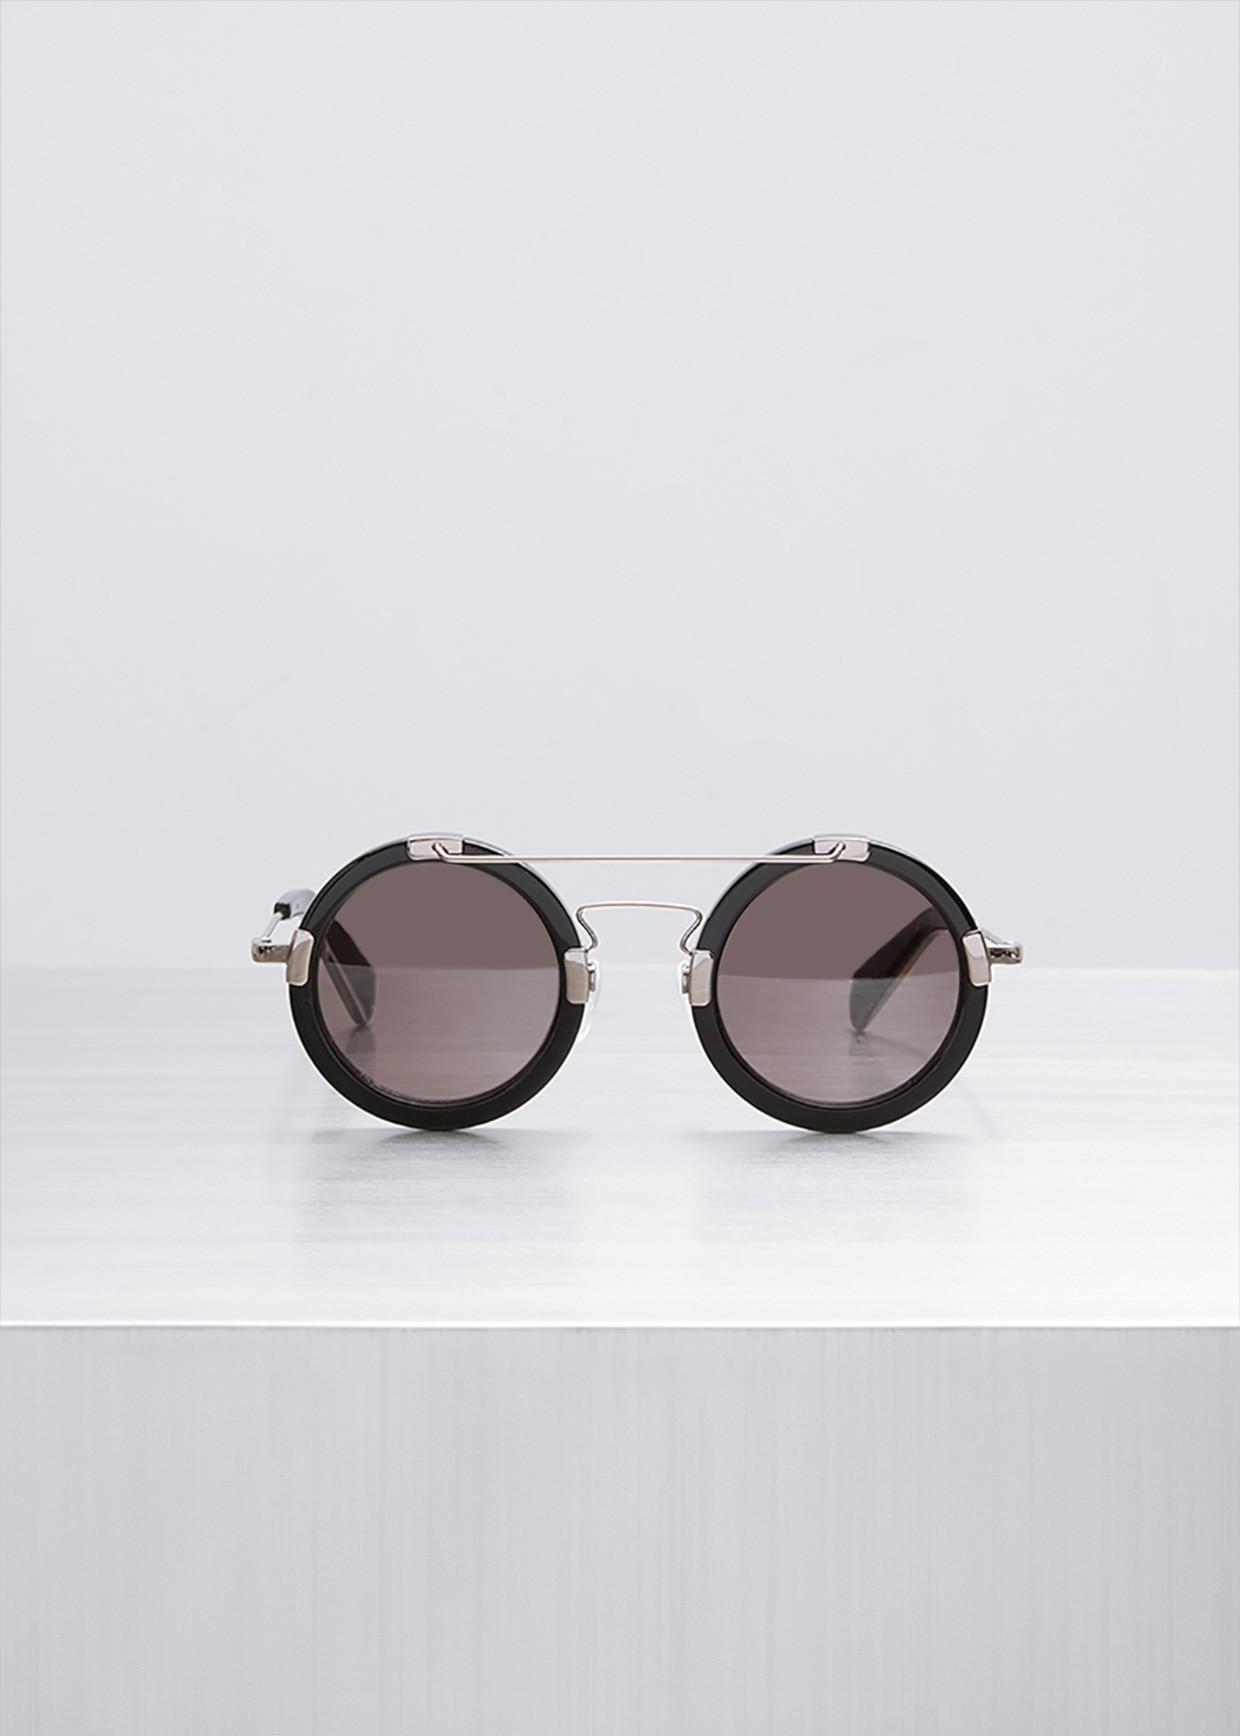 972a5ea563 Lyst - Yohji Yamamoto Black Aviator Round Sunglasses in Black